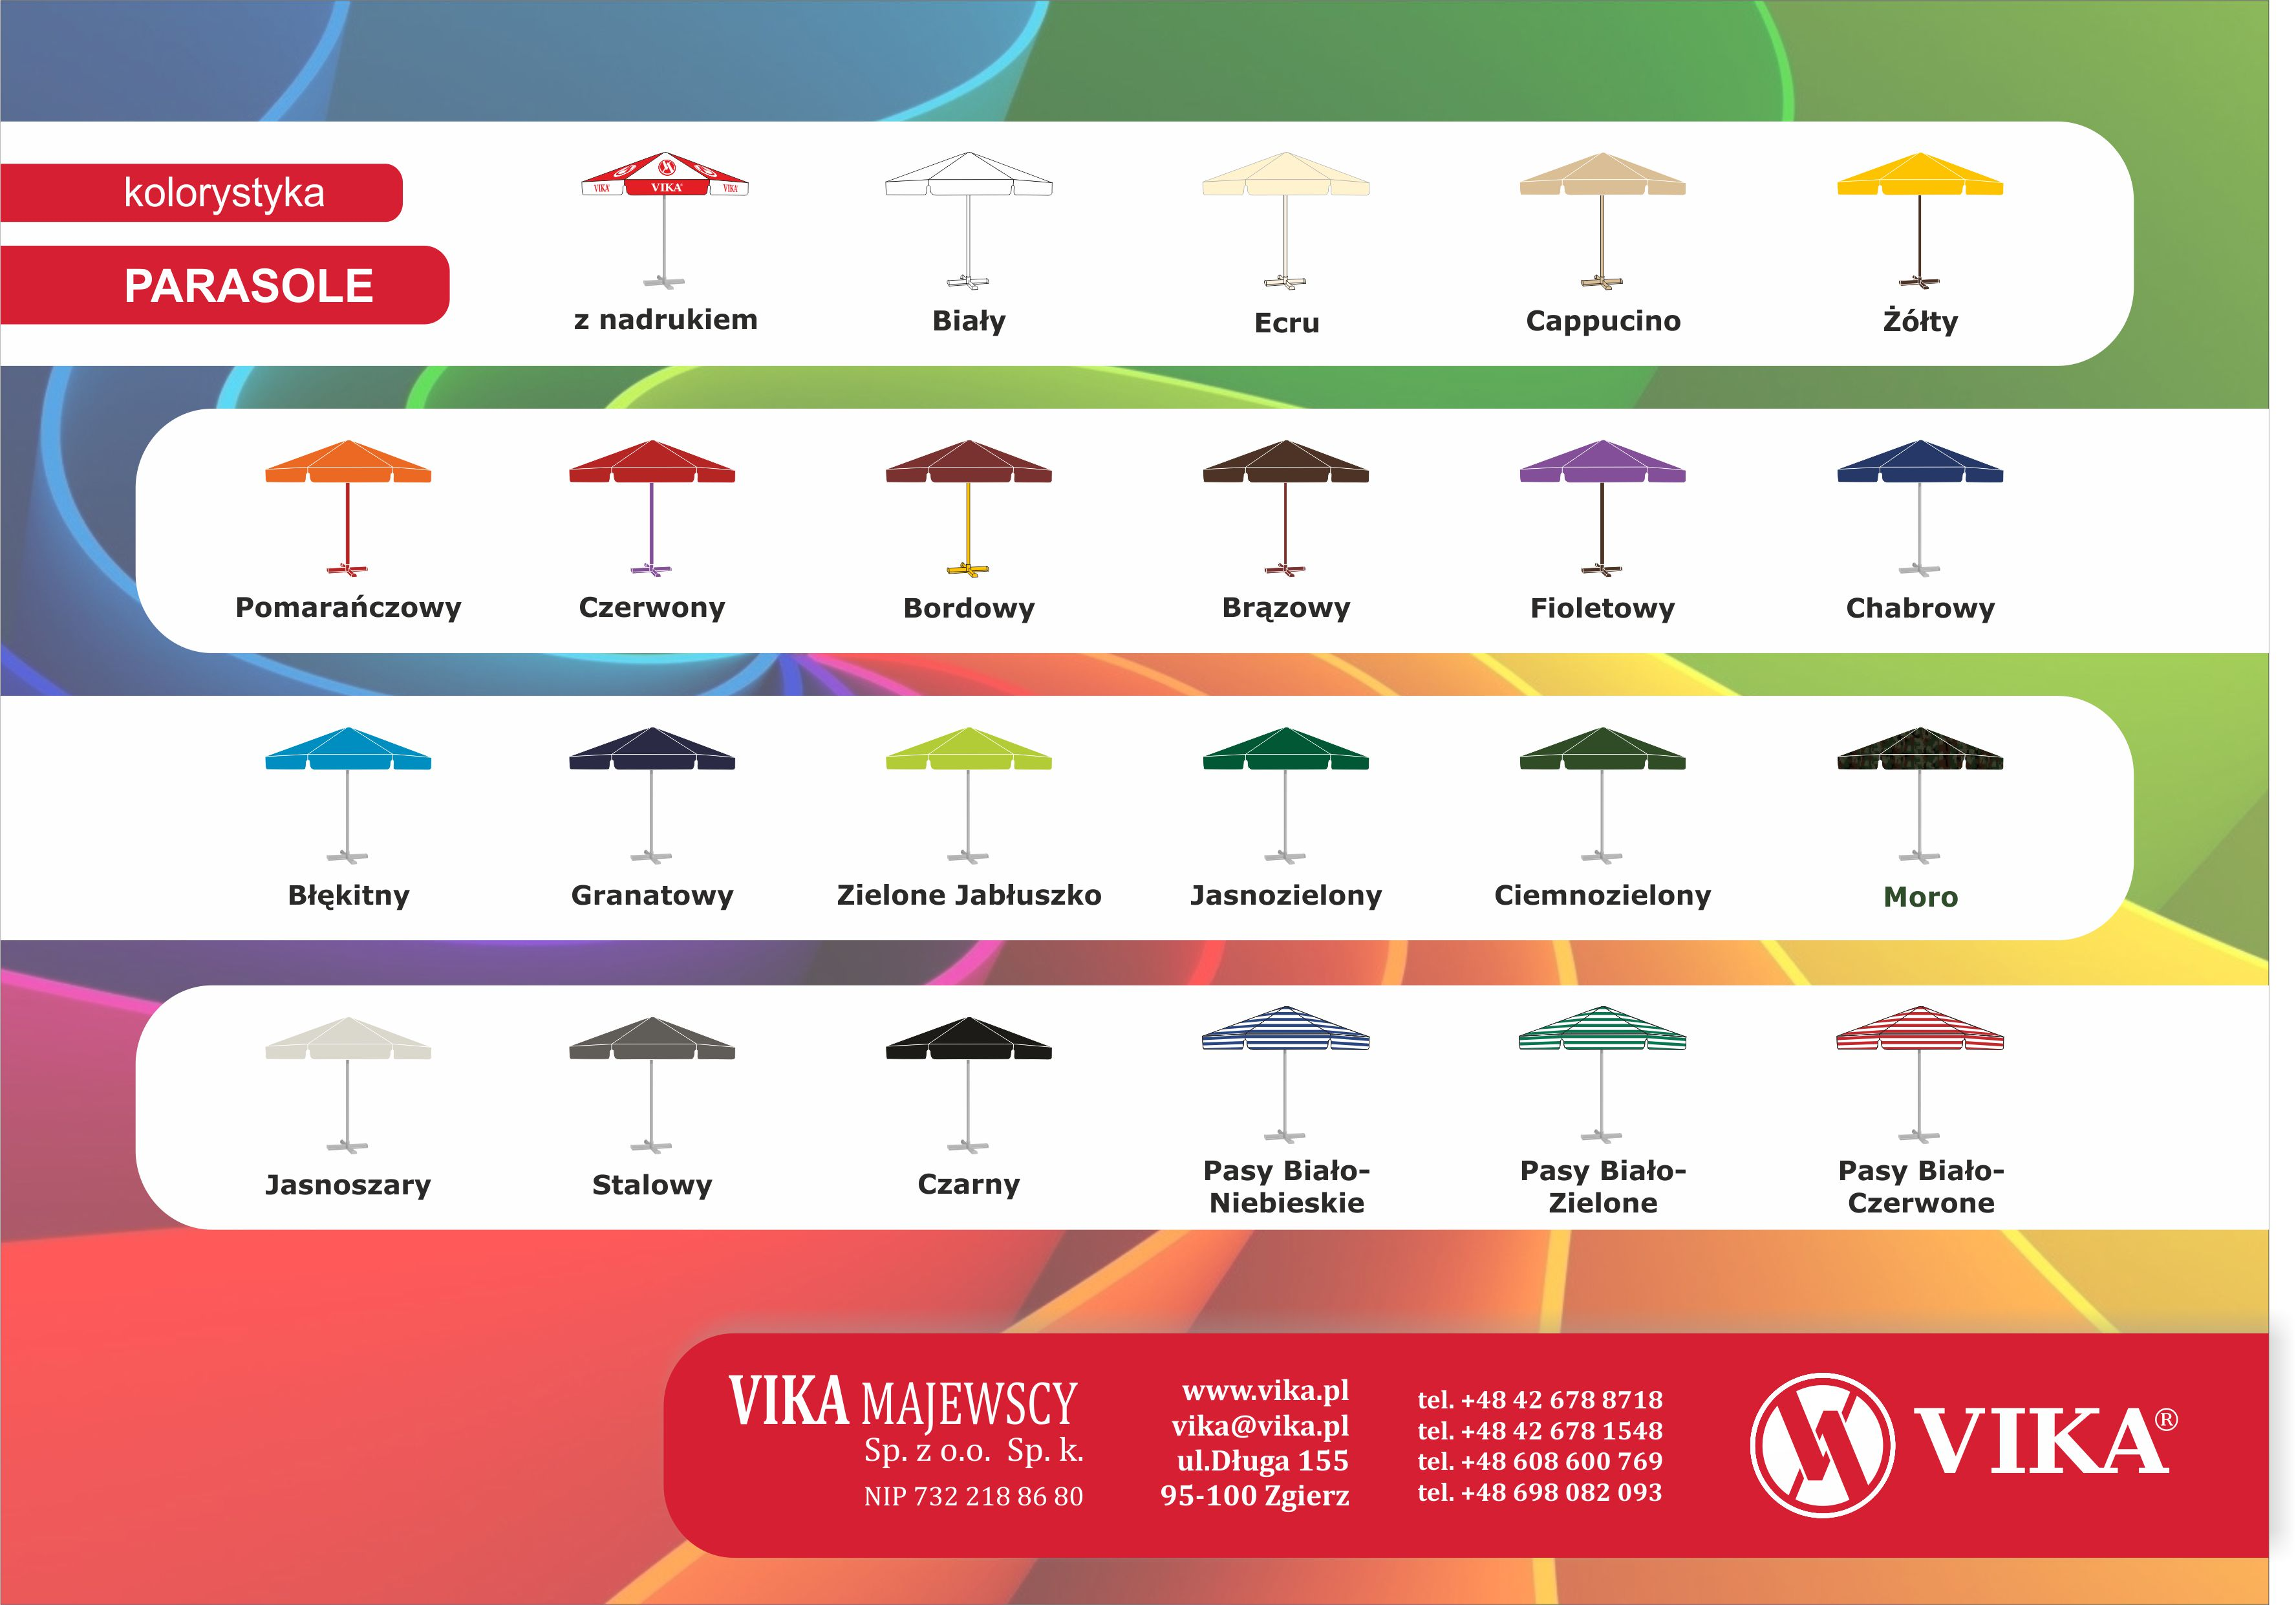 Kolorystyka parasoli